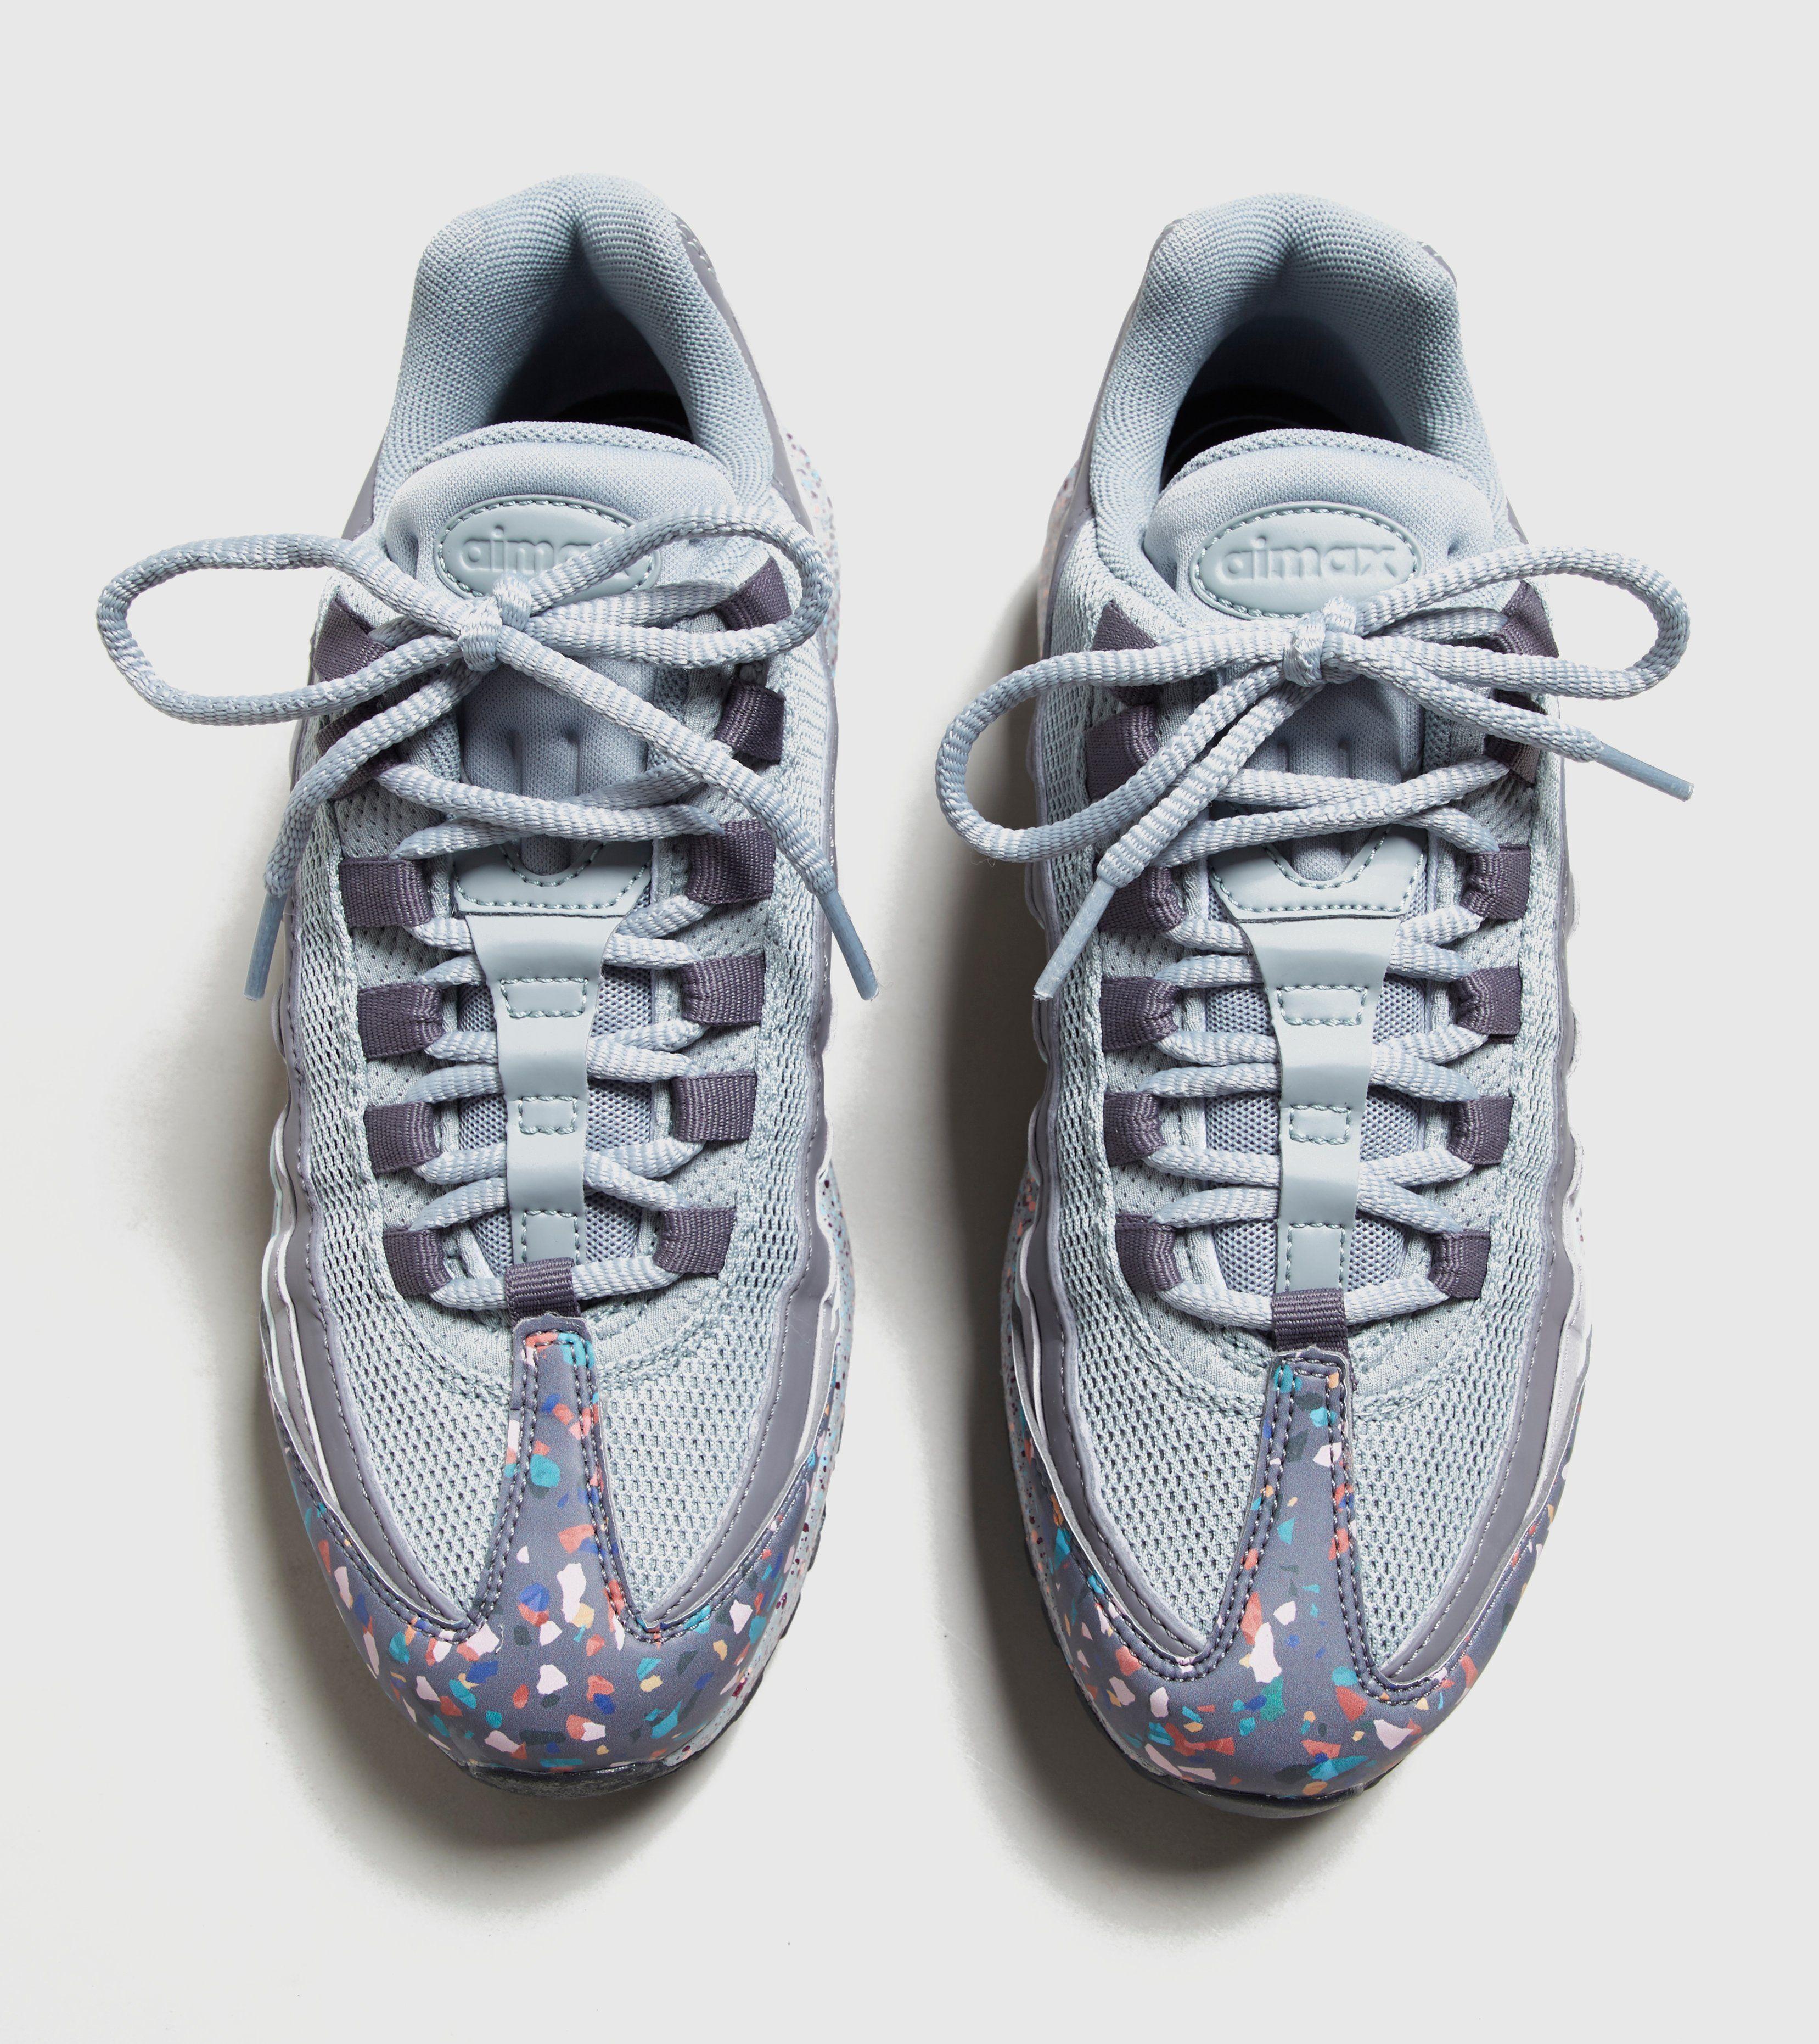 Nike Air Max 95 Terrazzo Femme